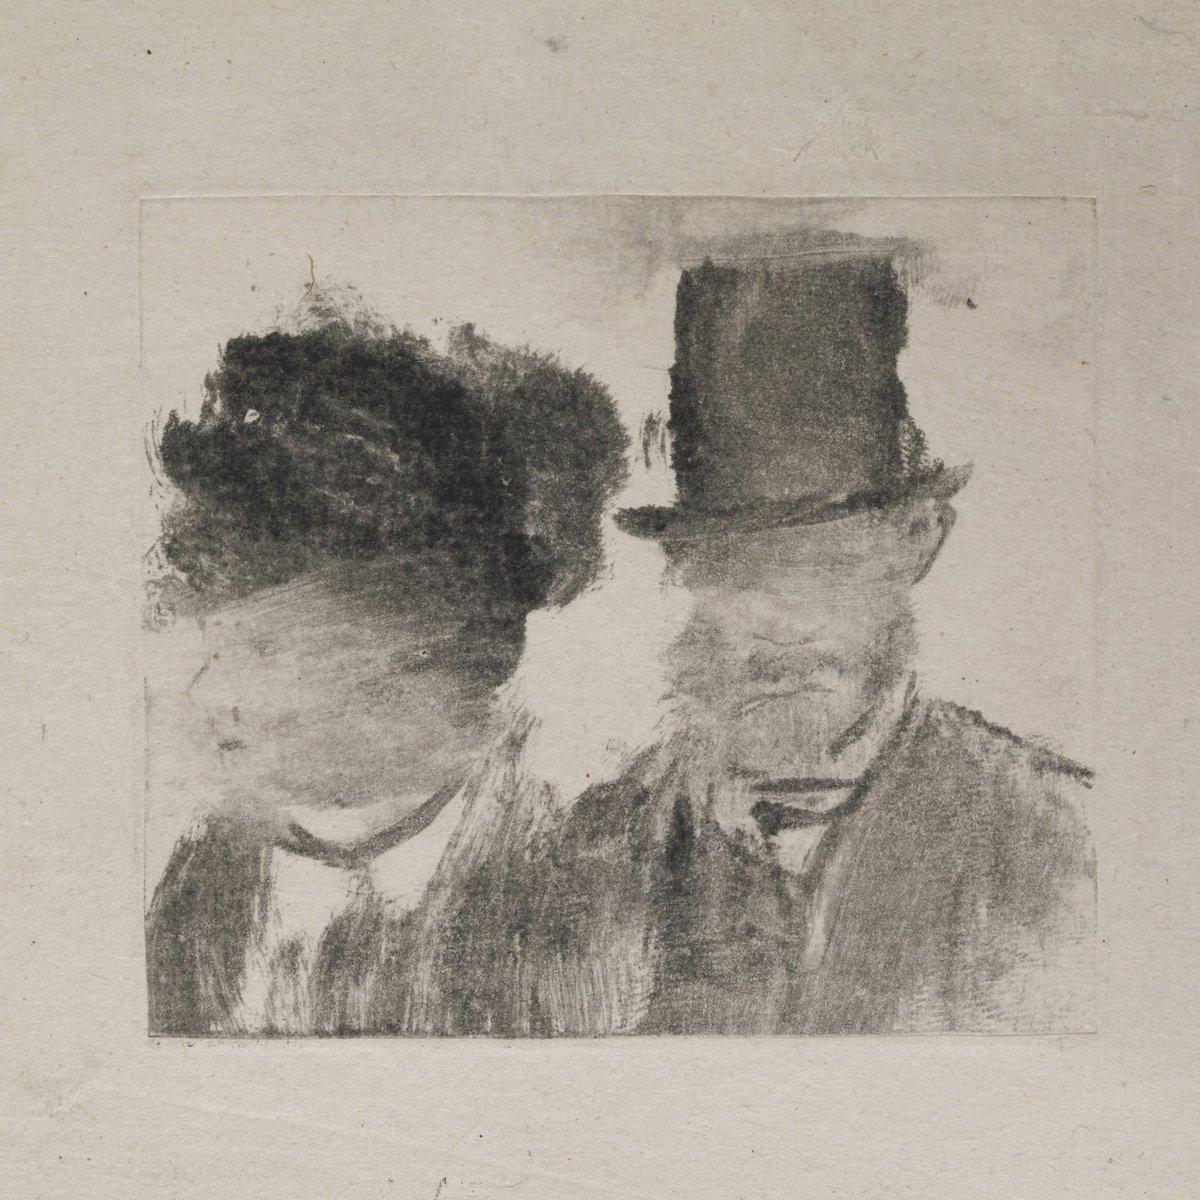 "Last chance: Don't miss Edgar Degas ""Strange New Beauty"" closing this 7/24 @MuseumModernArt: https://t.co/22uwdikZHY https://t.co/3TLsJW4npr"